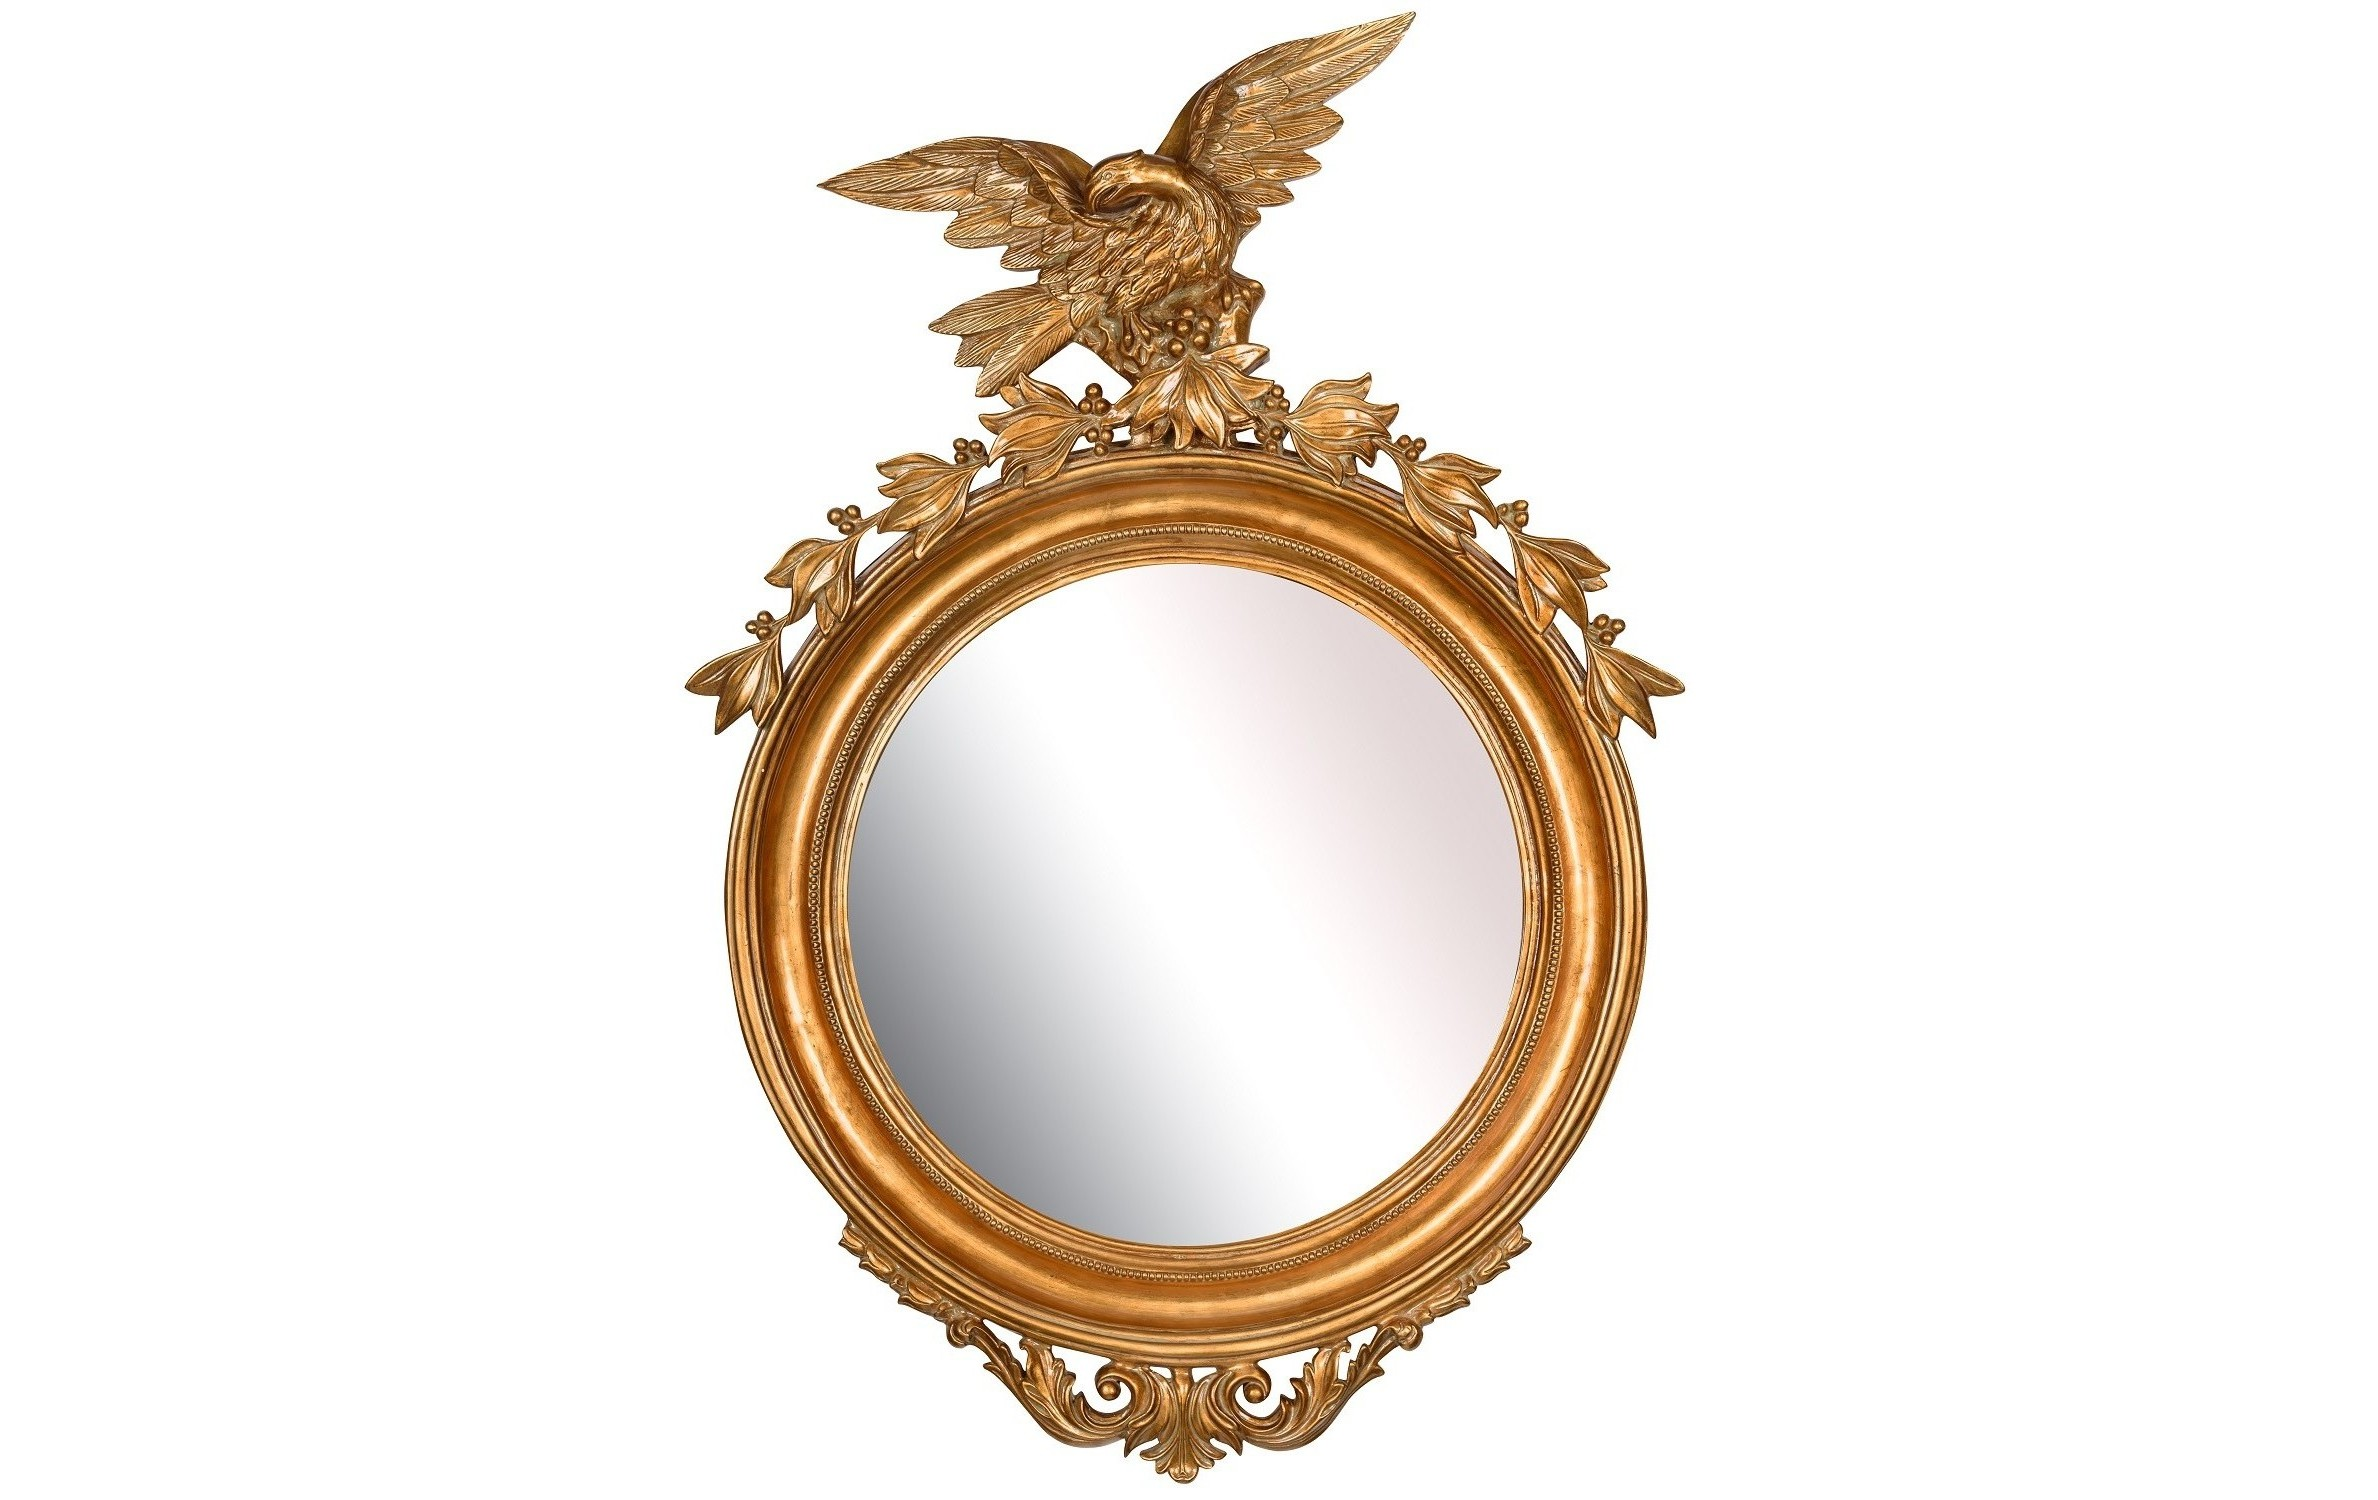 Зеркало EagleНастенные зеркала<br><br><br>Material: Полирезин<br>Width см: 75<br>Depth см: 11<br>Height см: 111